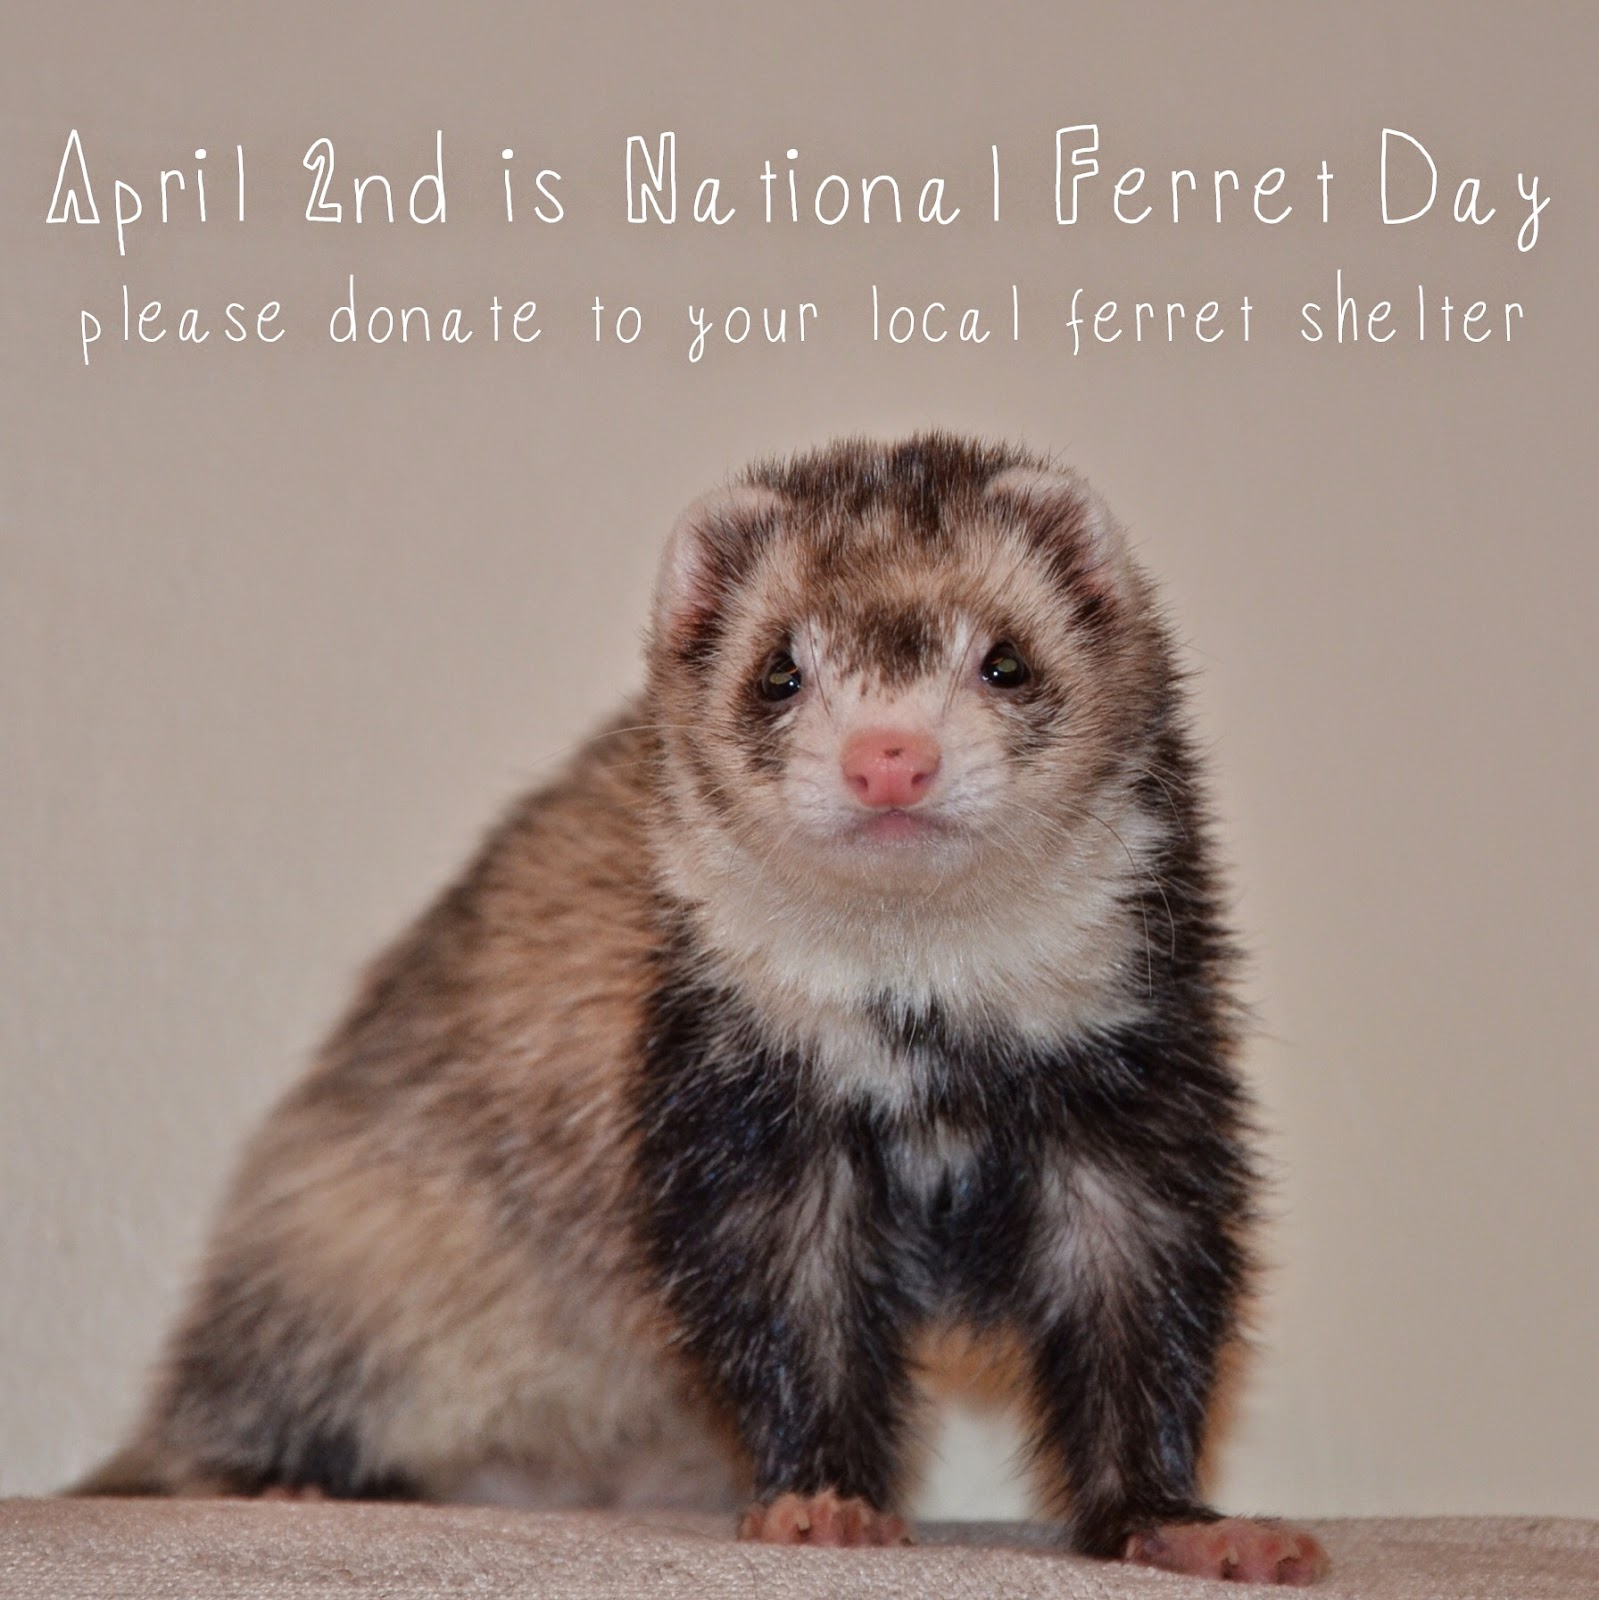 Happy National Ferret Day